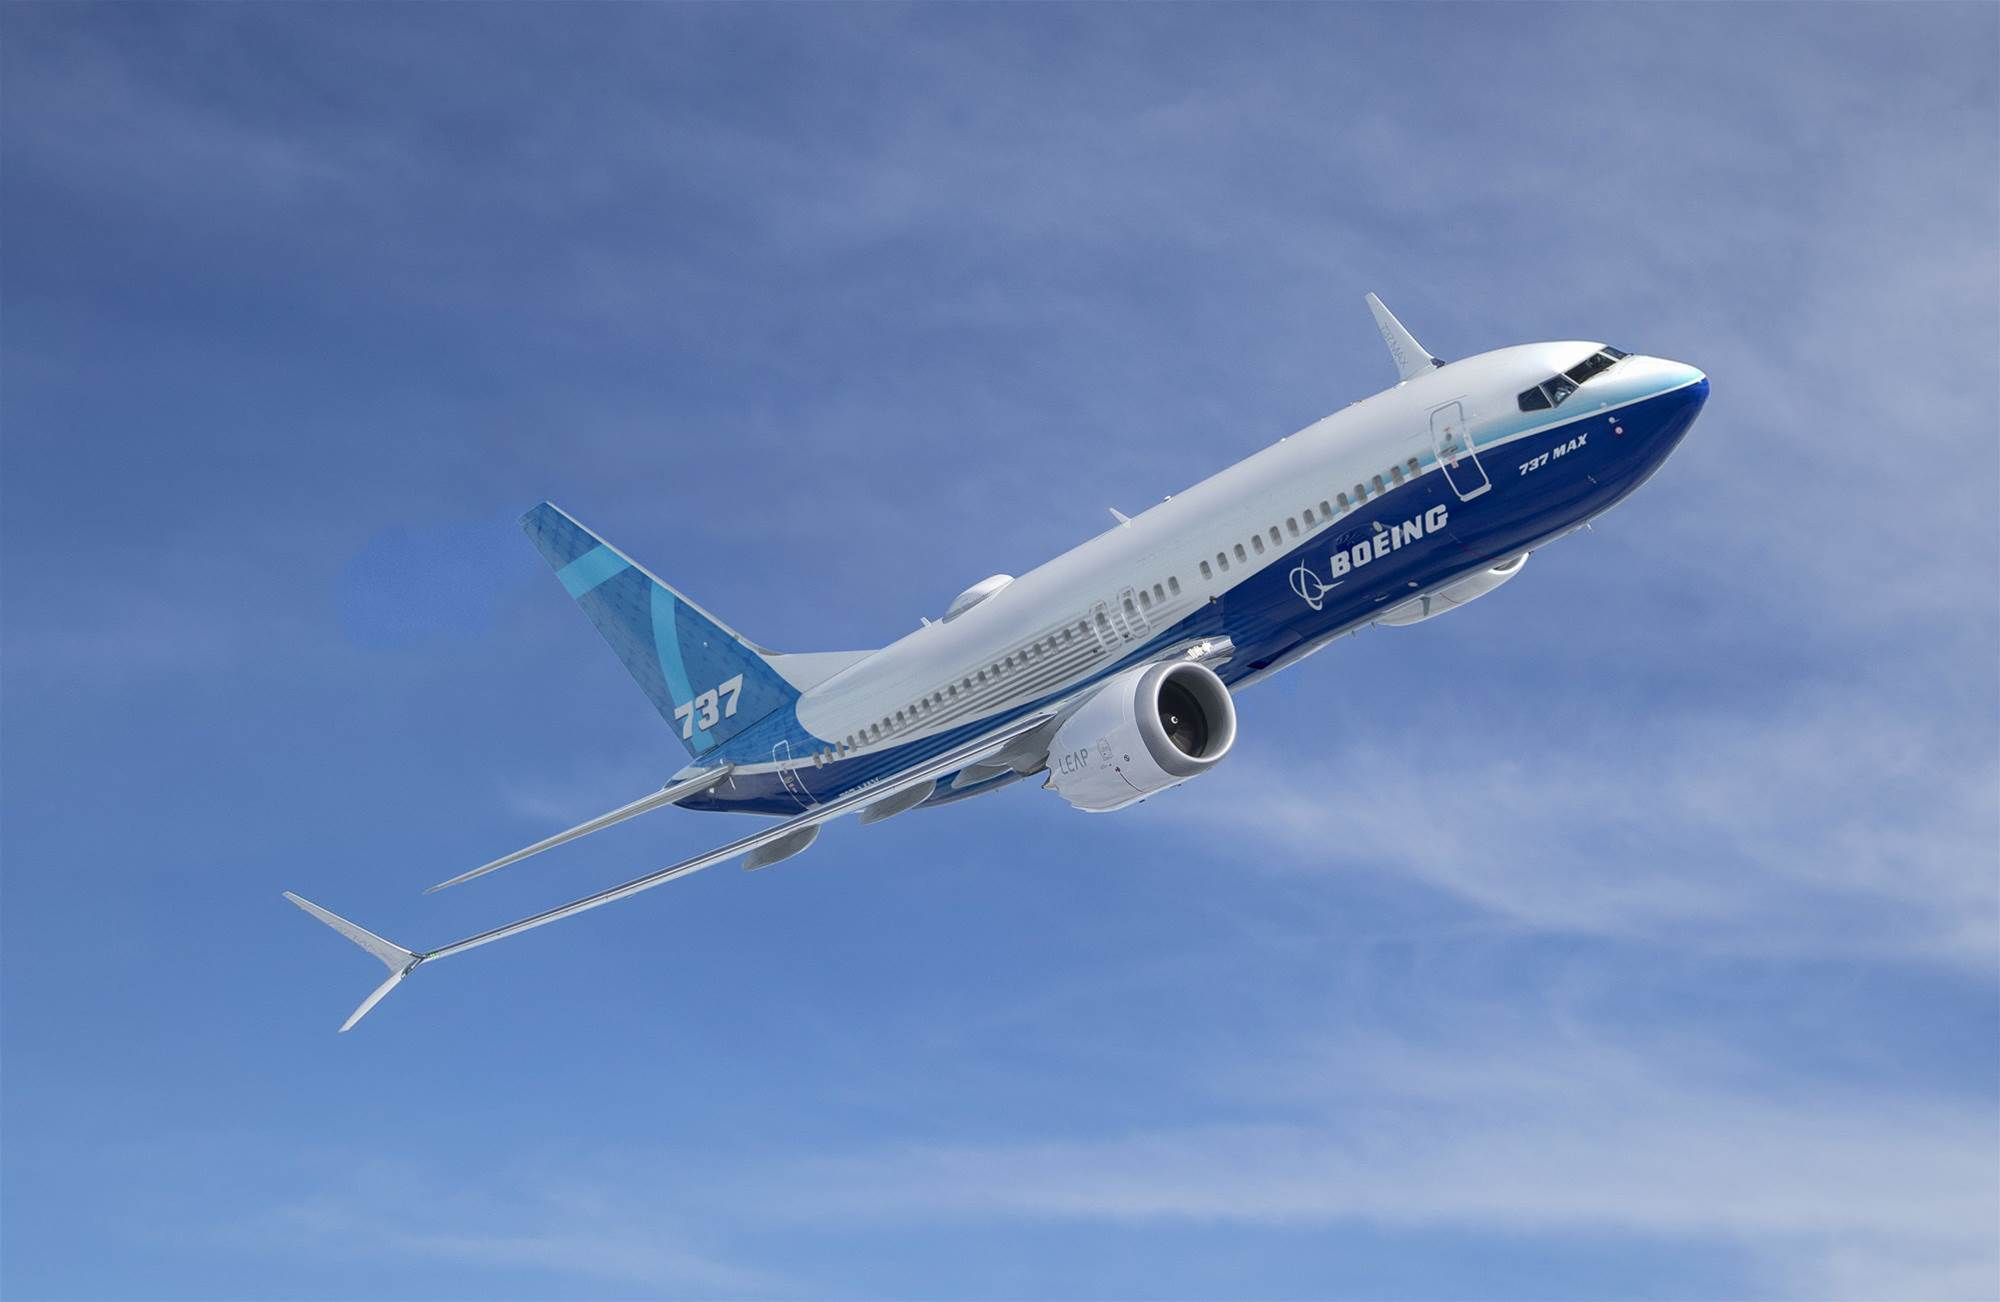 Boeing to upgrade software in 737 MAX 8 fleet in 'weeks'